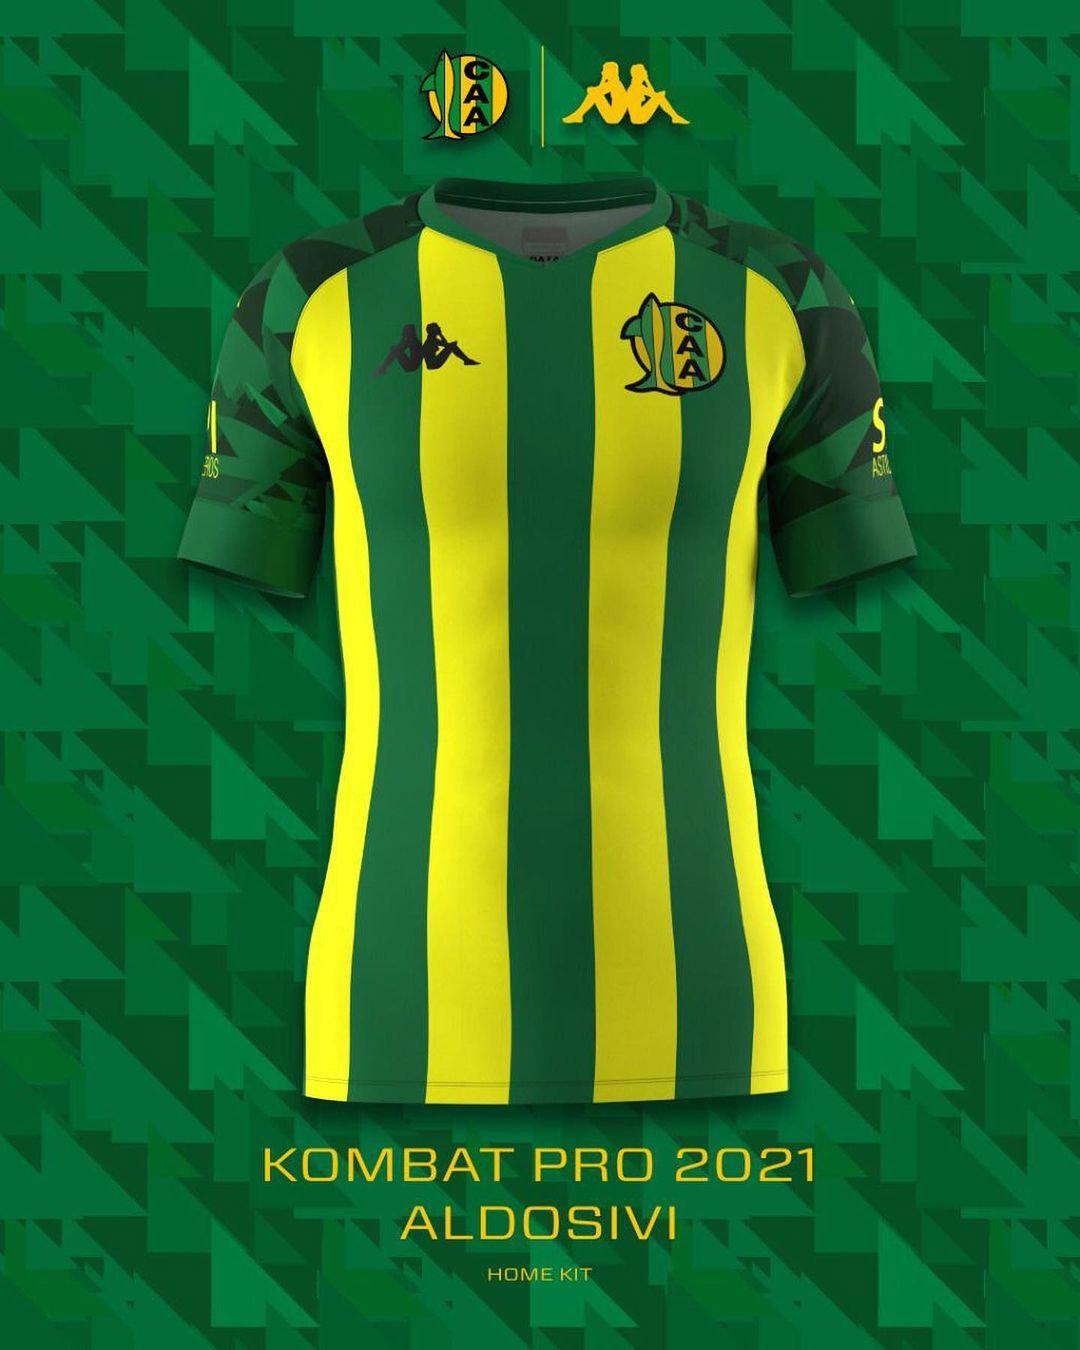 Camisas do CA Aldosivi 2021 Kappa 1